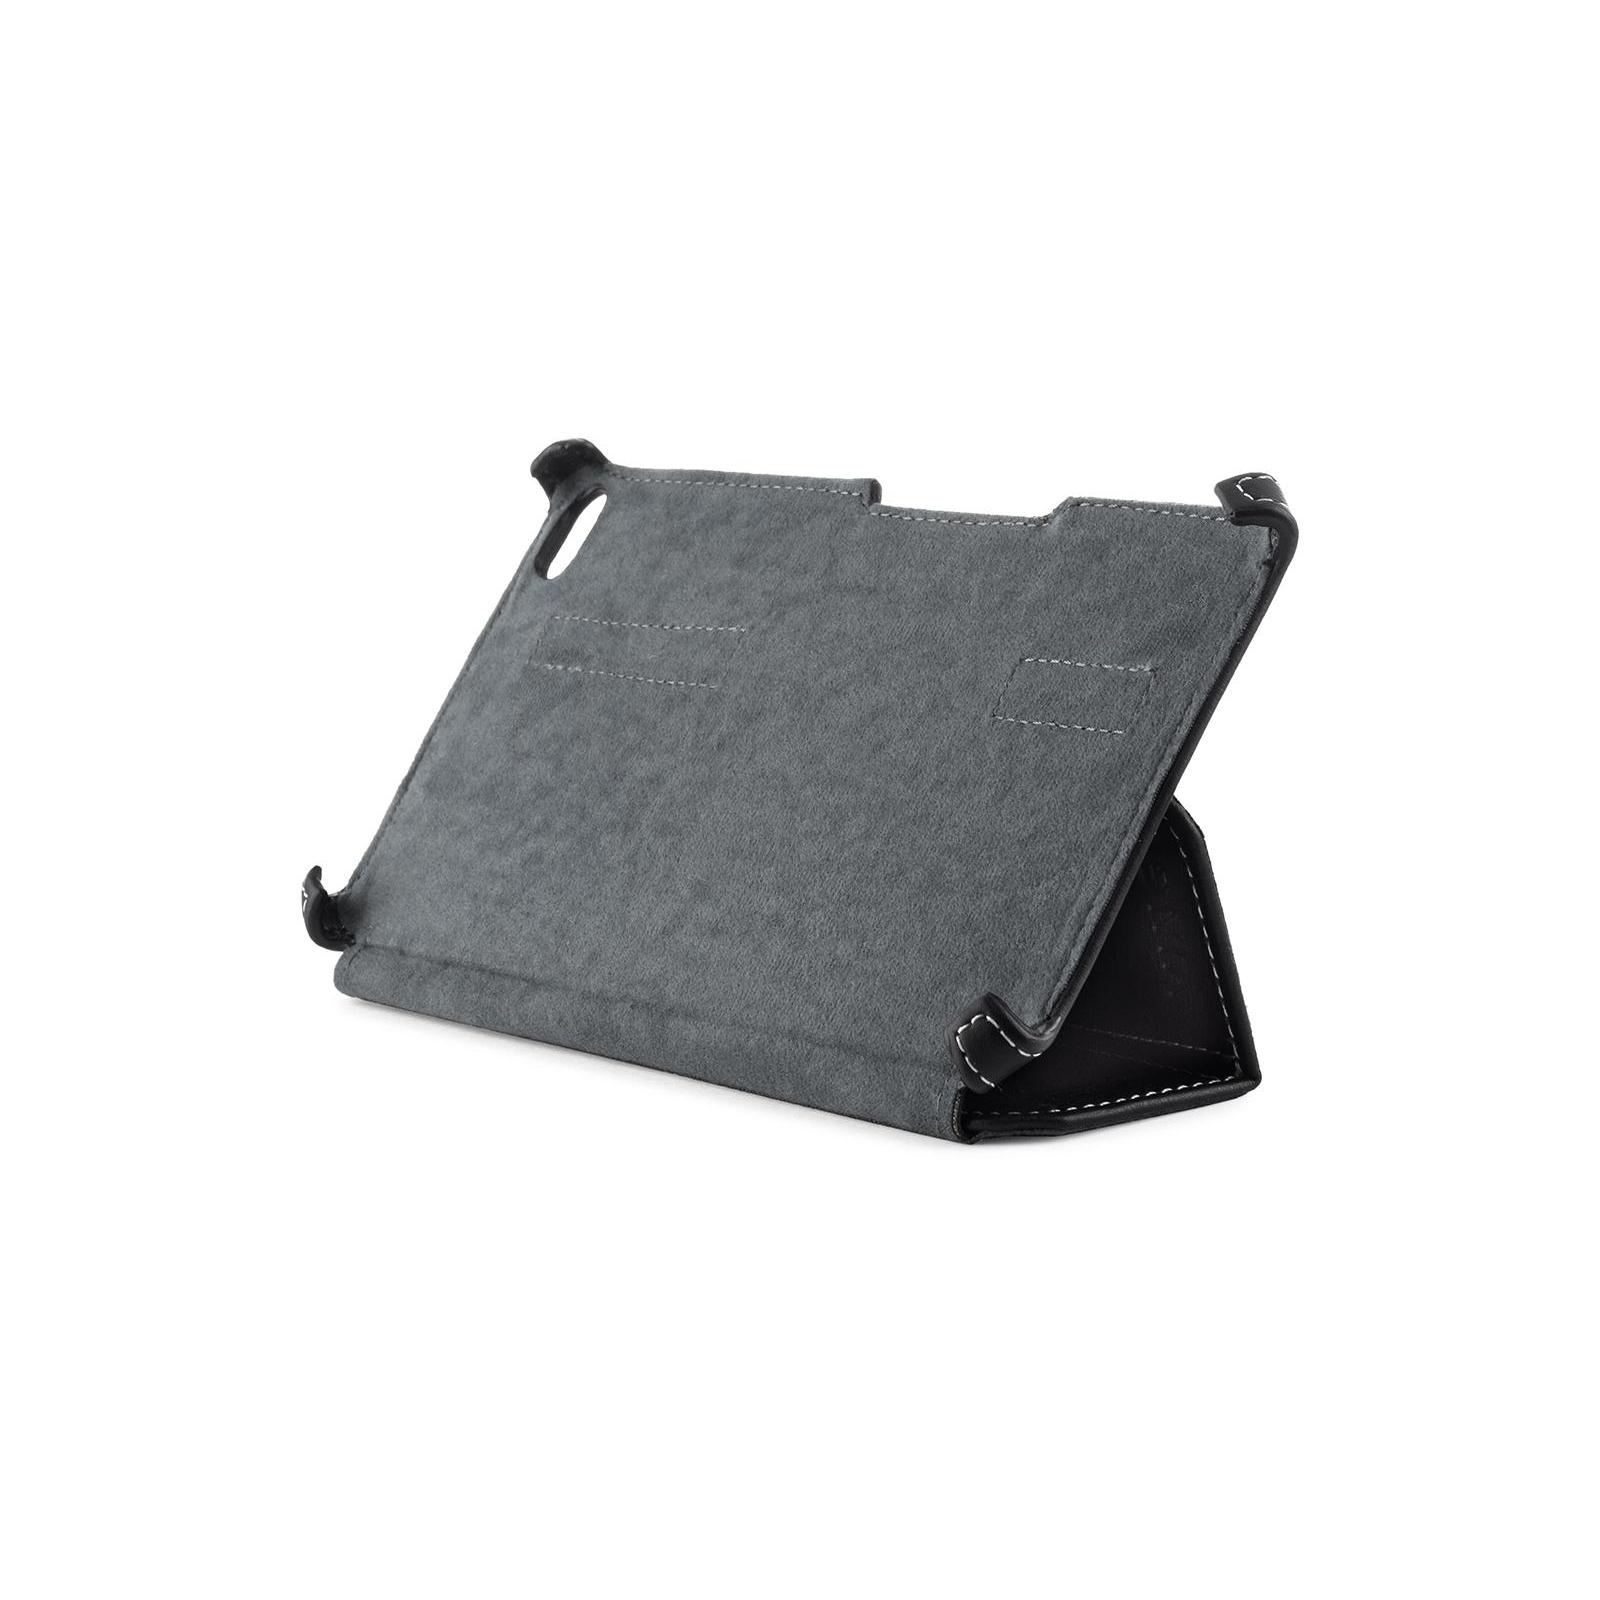 Чехол для планшета Lenovo Tab 4 7 TB-7304I black Vinga (VNTB7304I) изображение 4